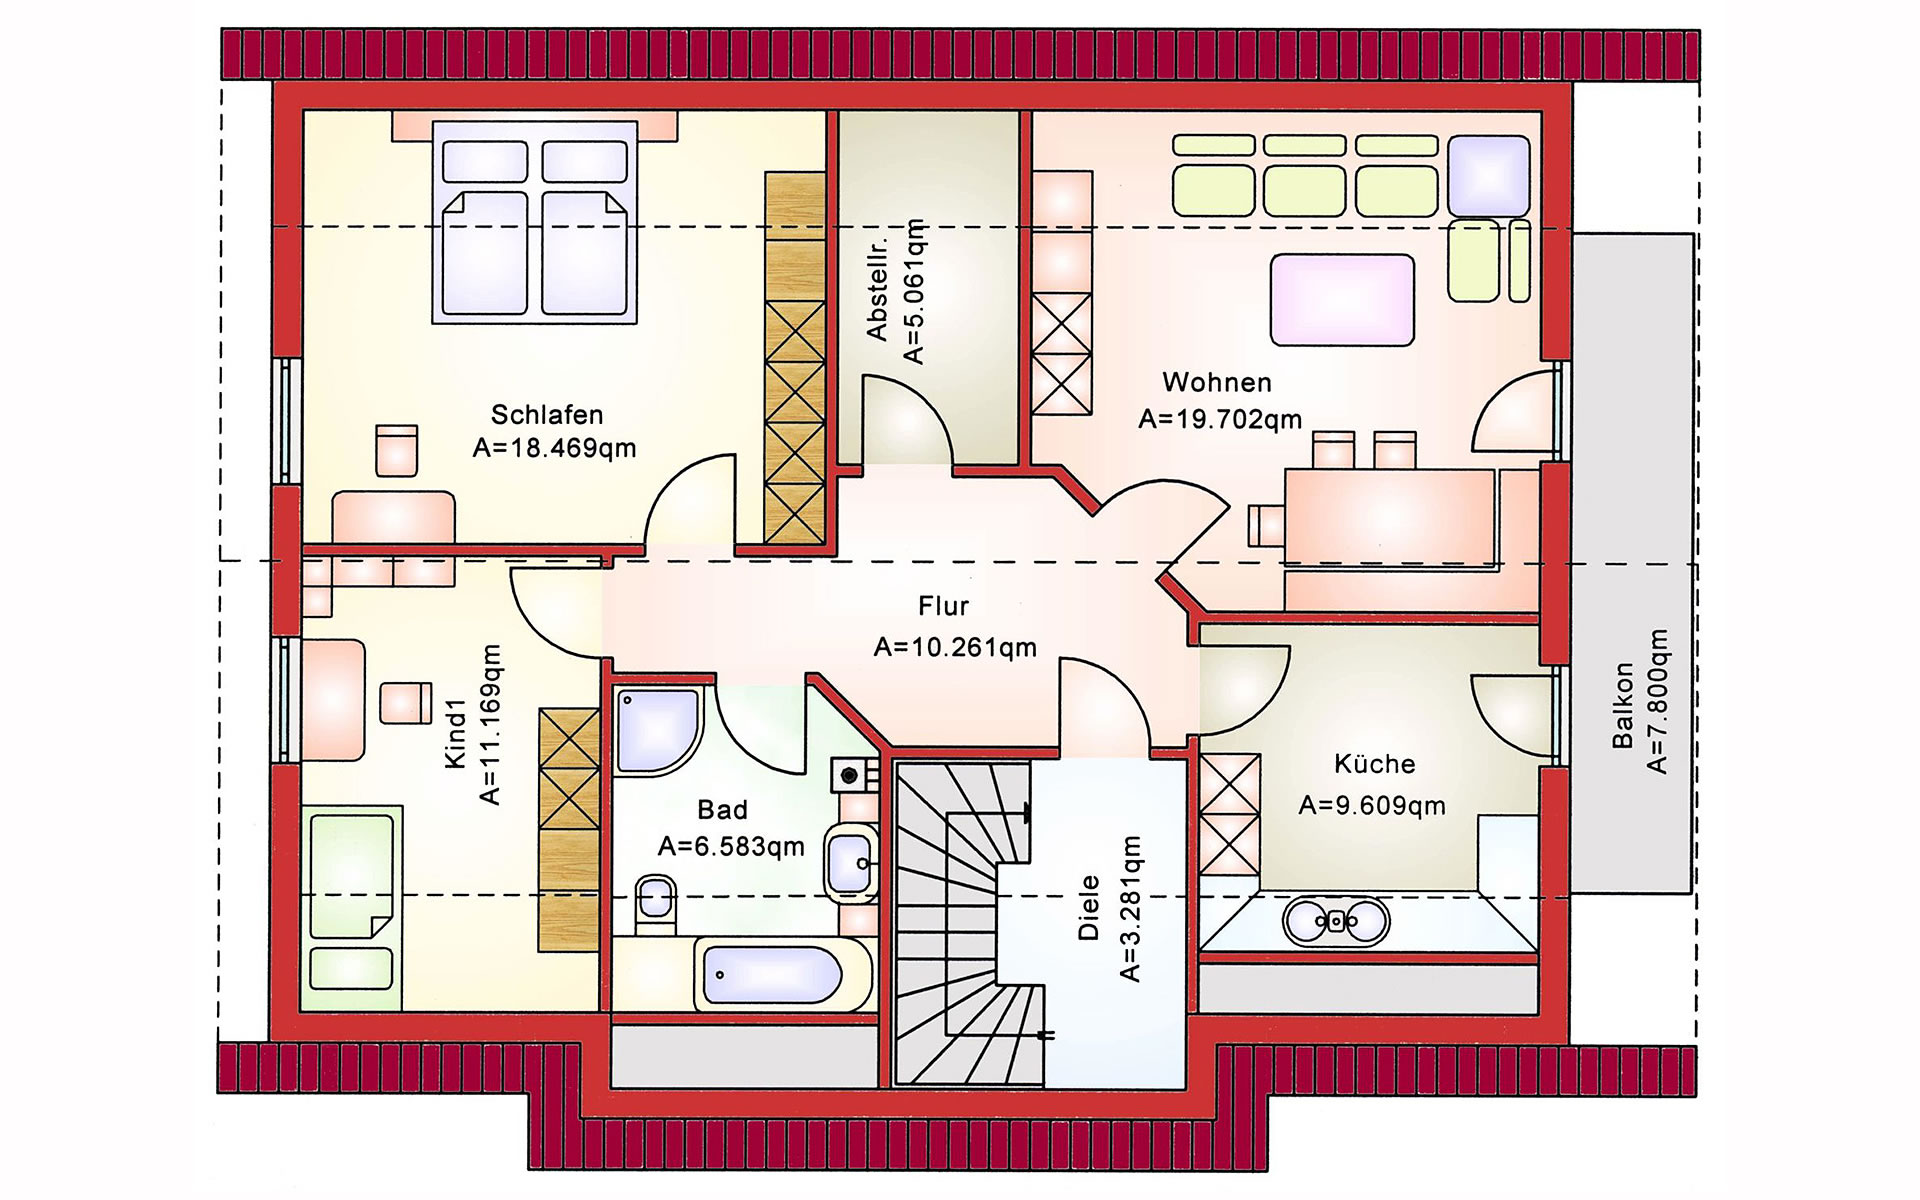 Dachgeschoss Zweifamilienhaus BS 181 von B&S Selbstbausysteme GmbH & Co. KG